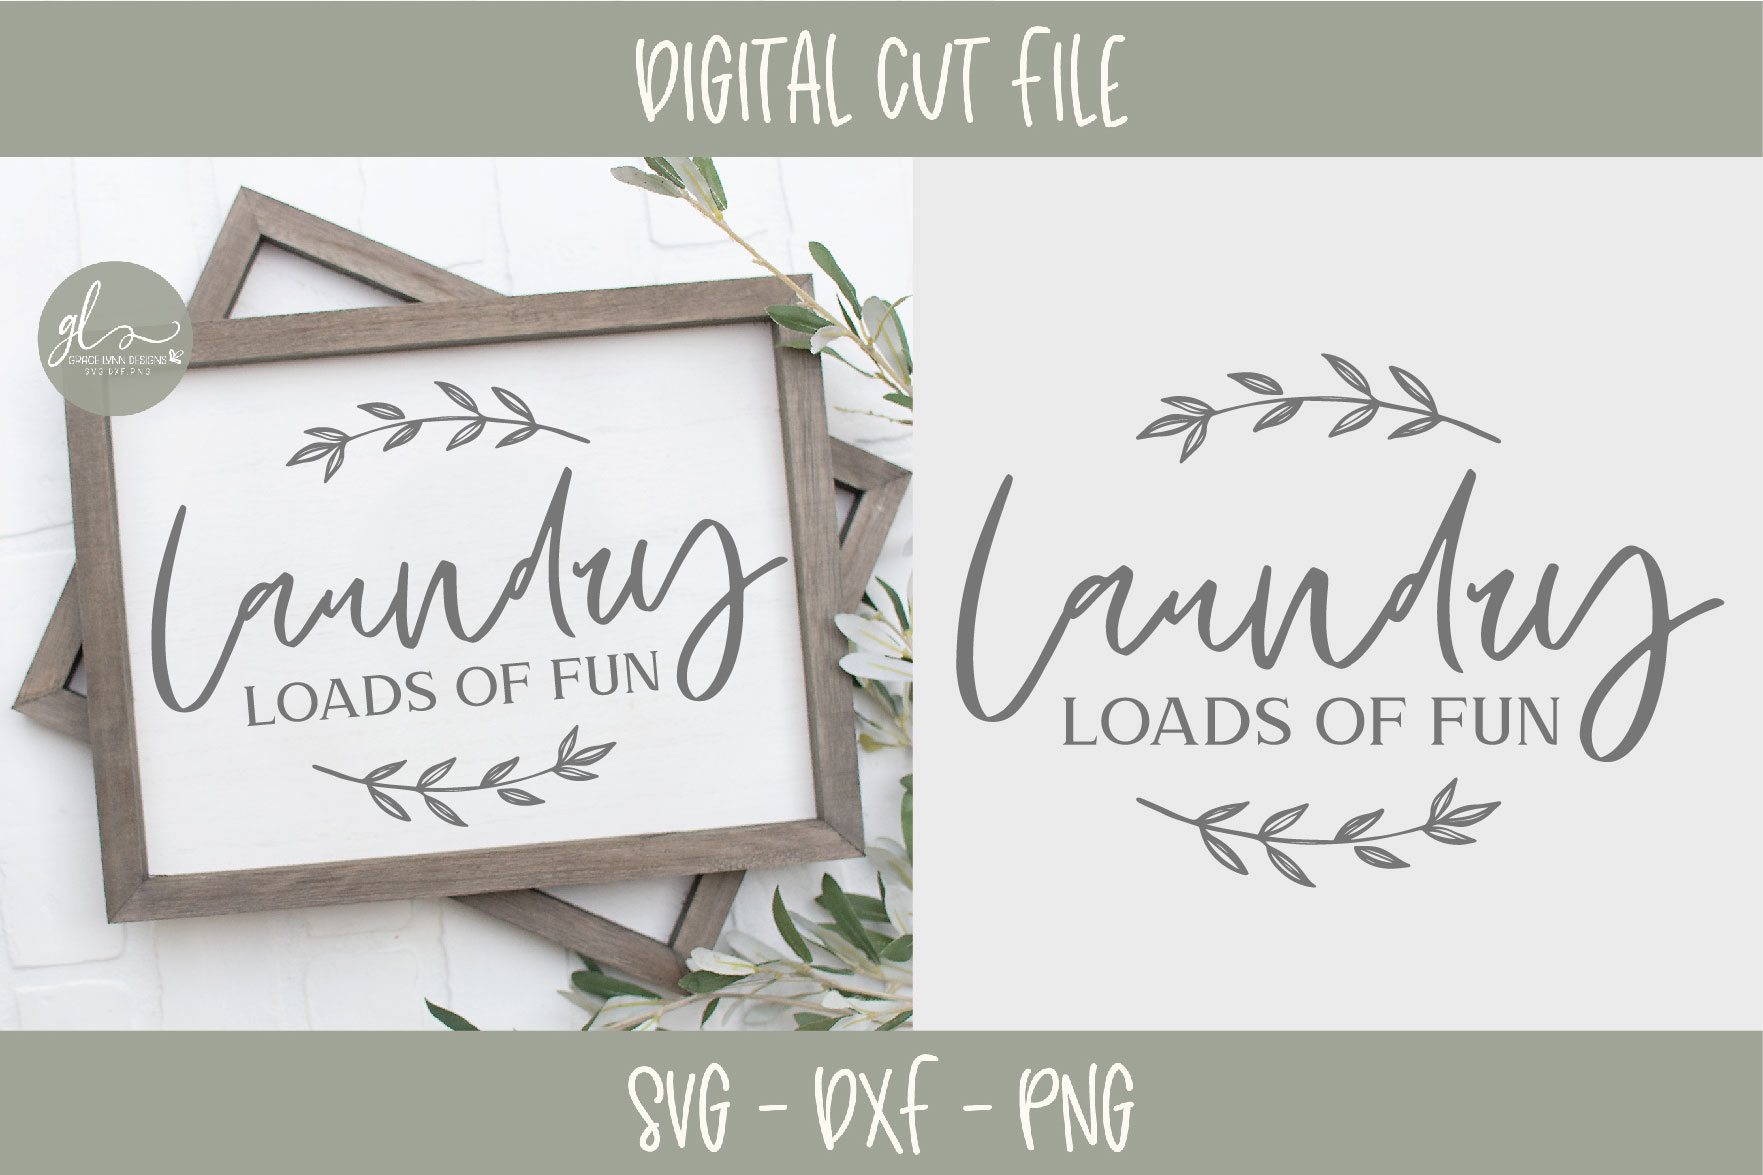 Laundry Sign Bundle - 20 Designs - SVG Cut Files example image 2